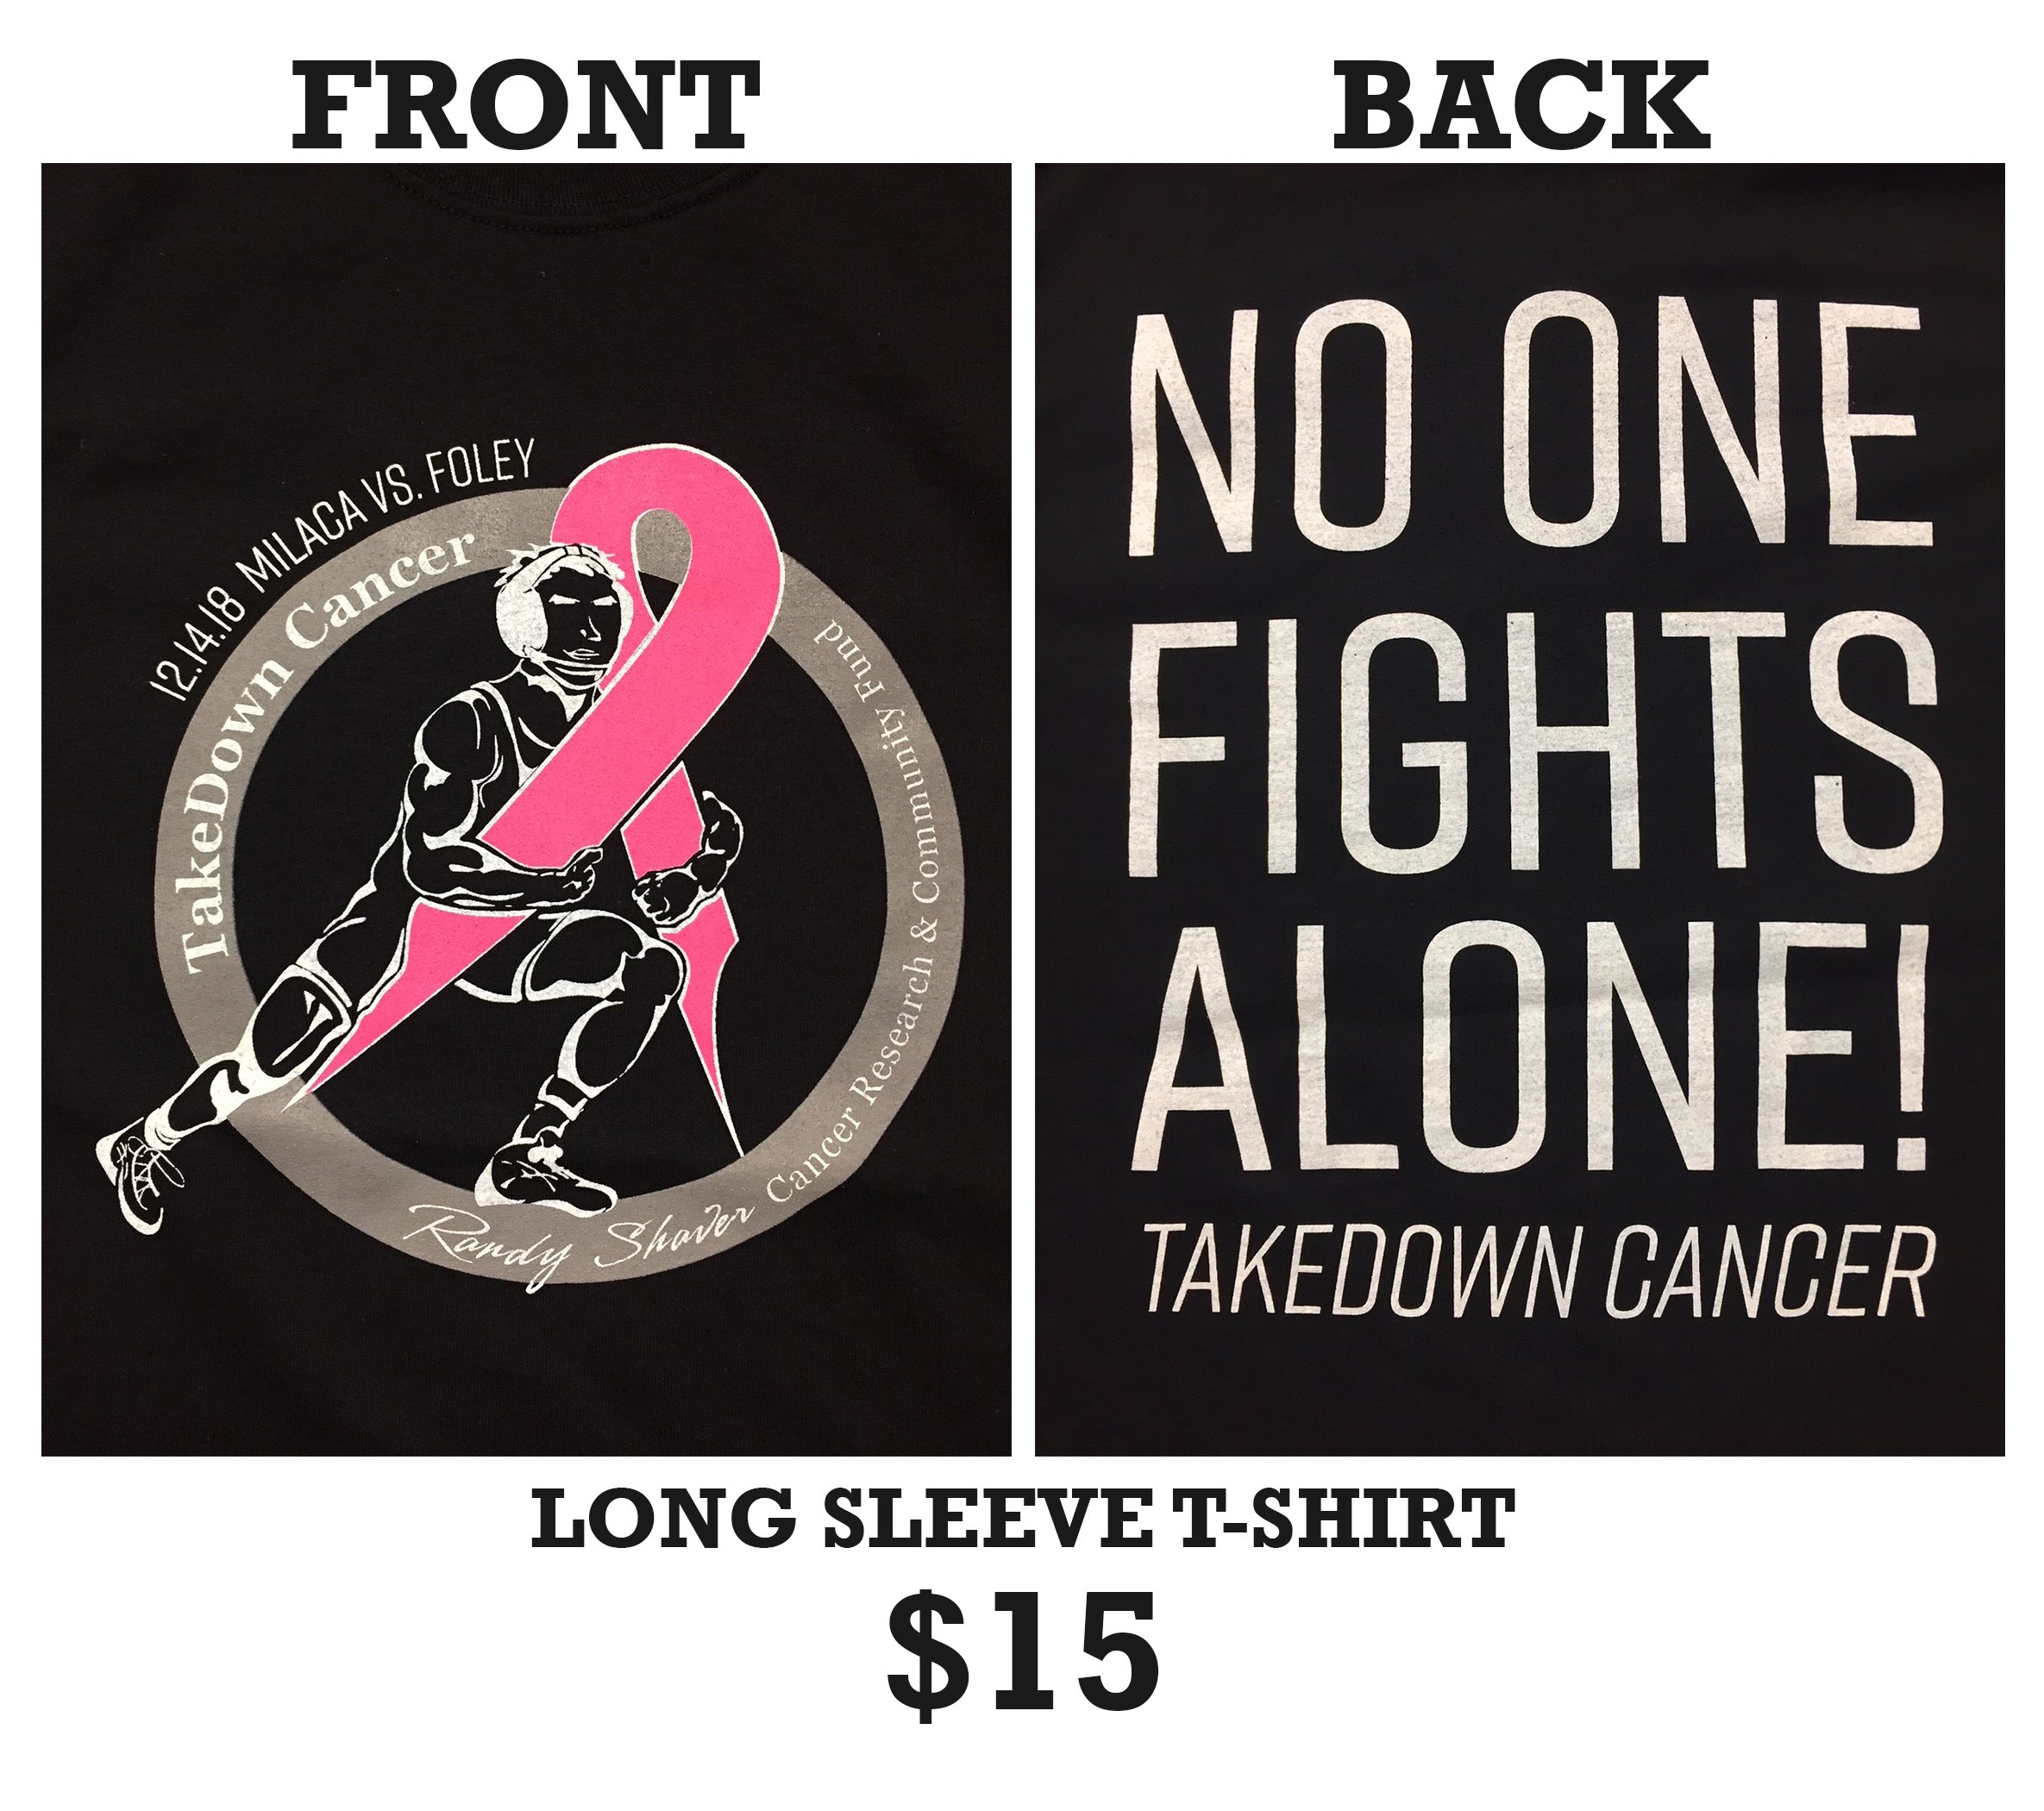 Takedown Cancer T-shirts